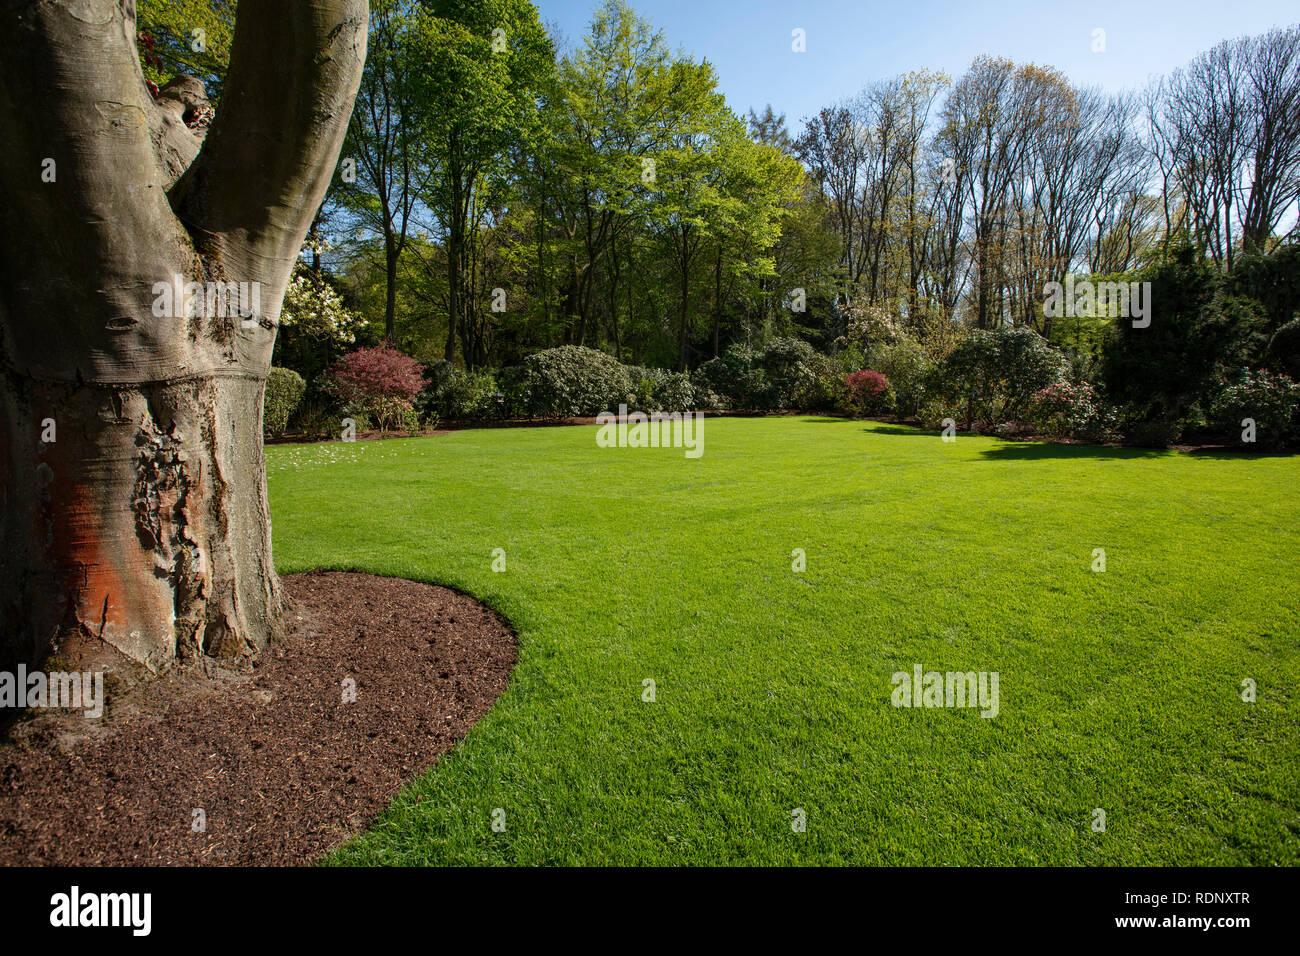 Garden, Garten Stock Photo